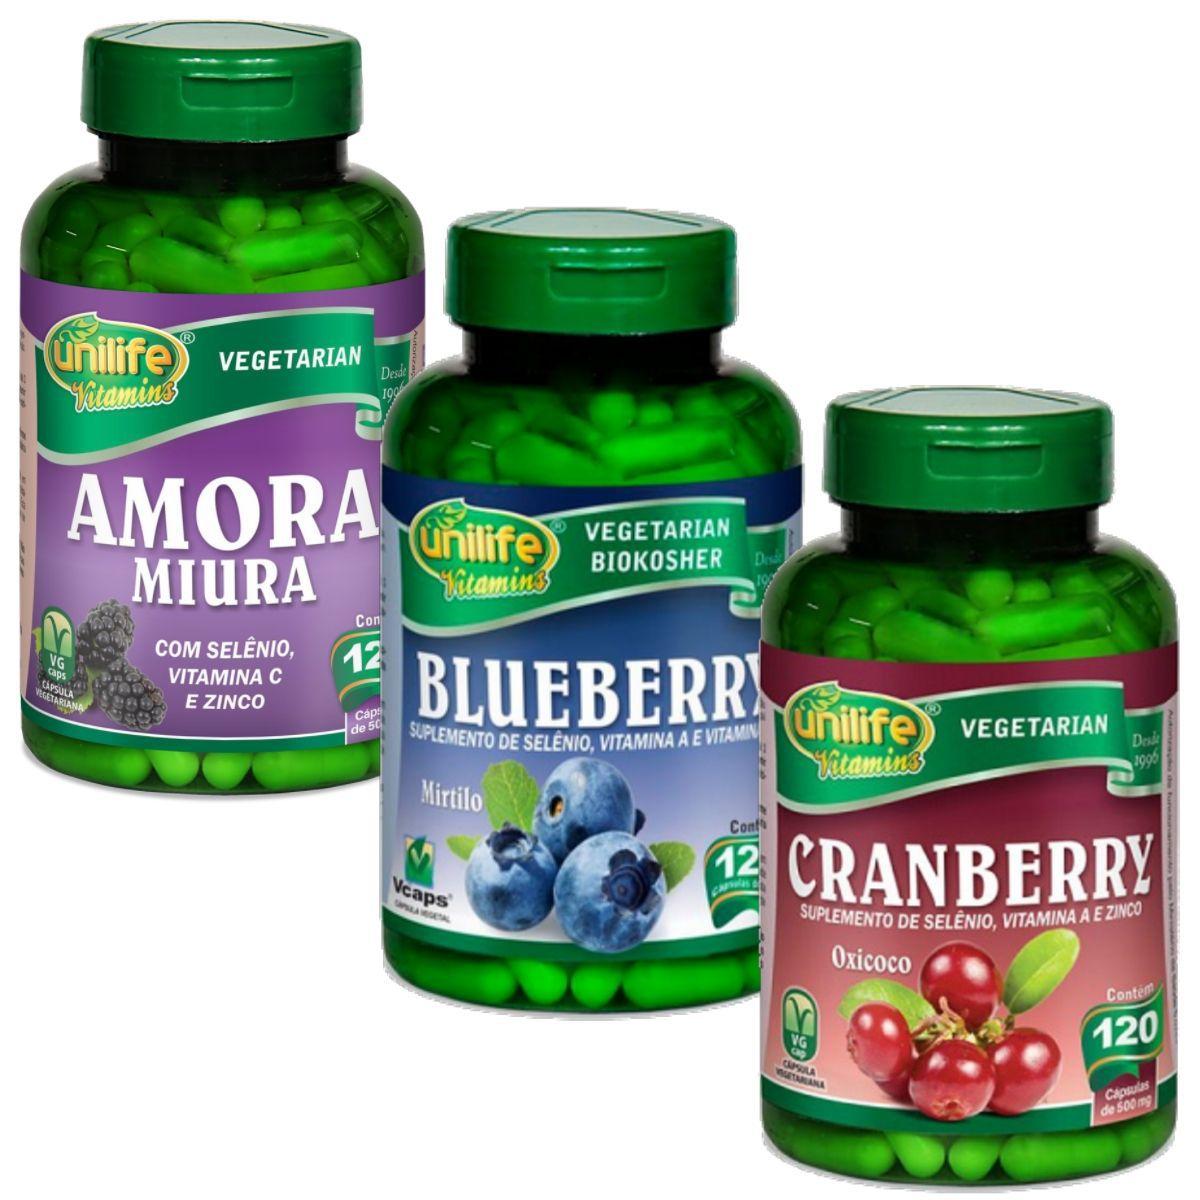 Kit Polifenóis - Amora Miura + Blueberry + Cranberry - Unilife 120 Cápsulas